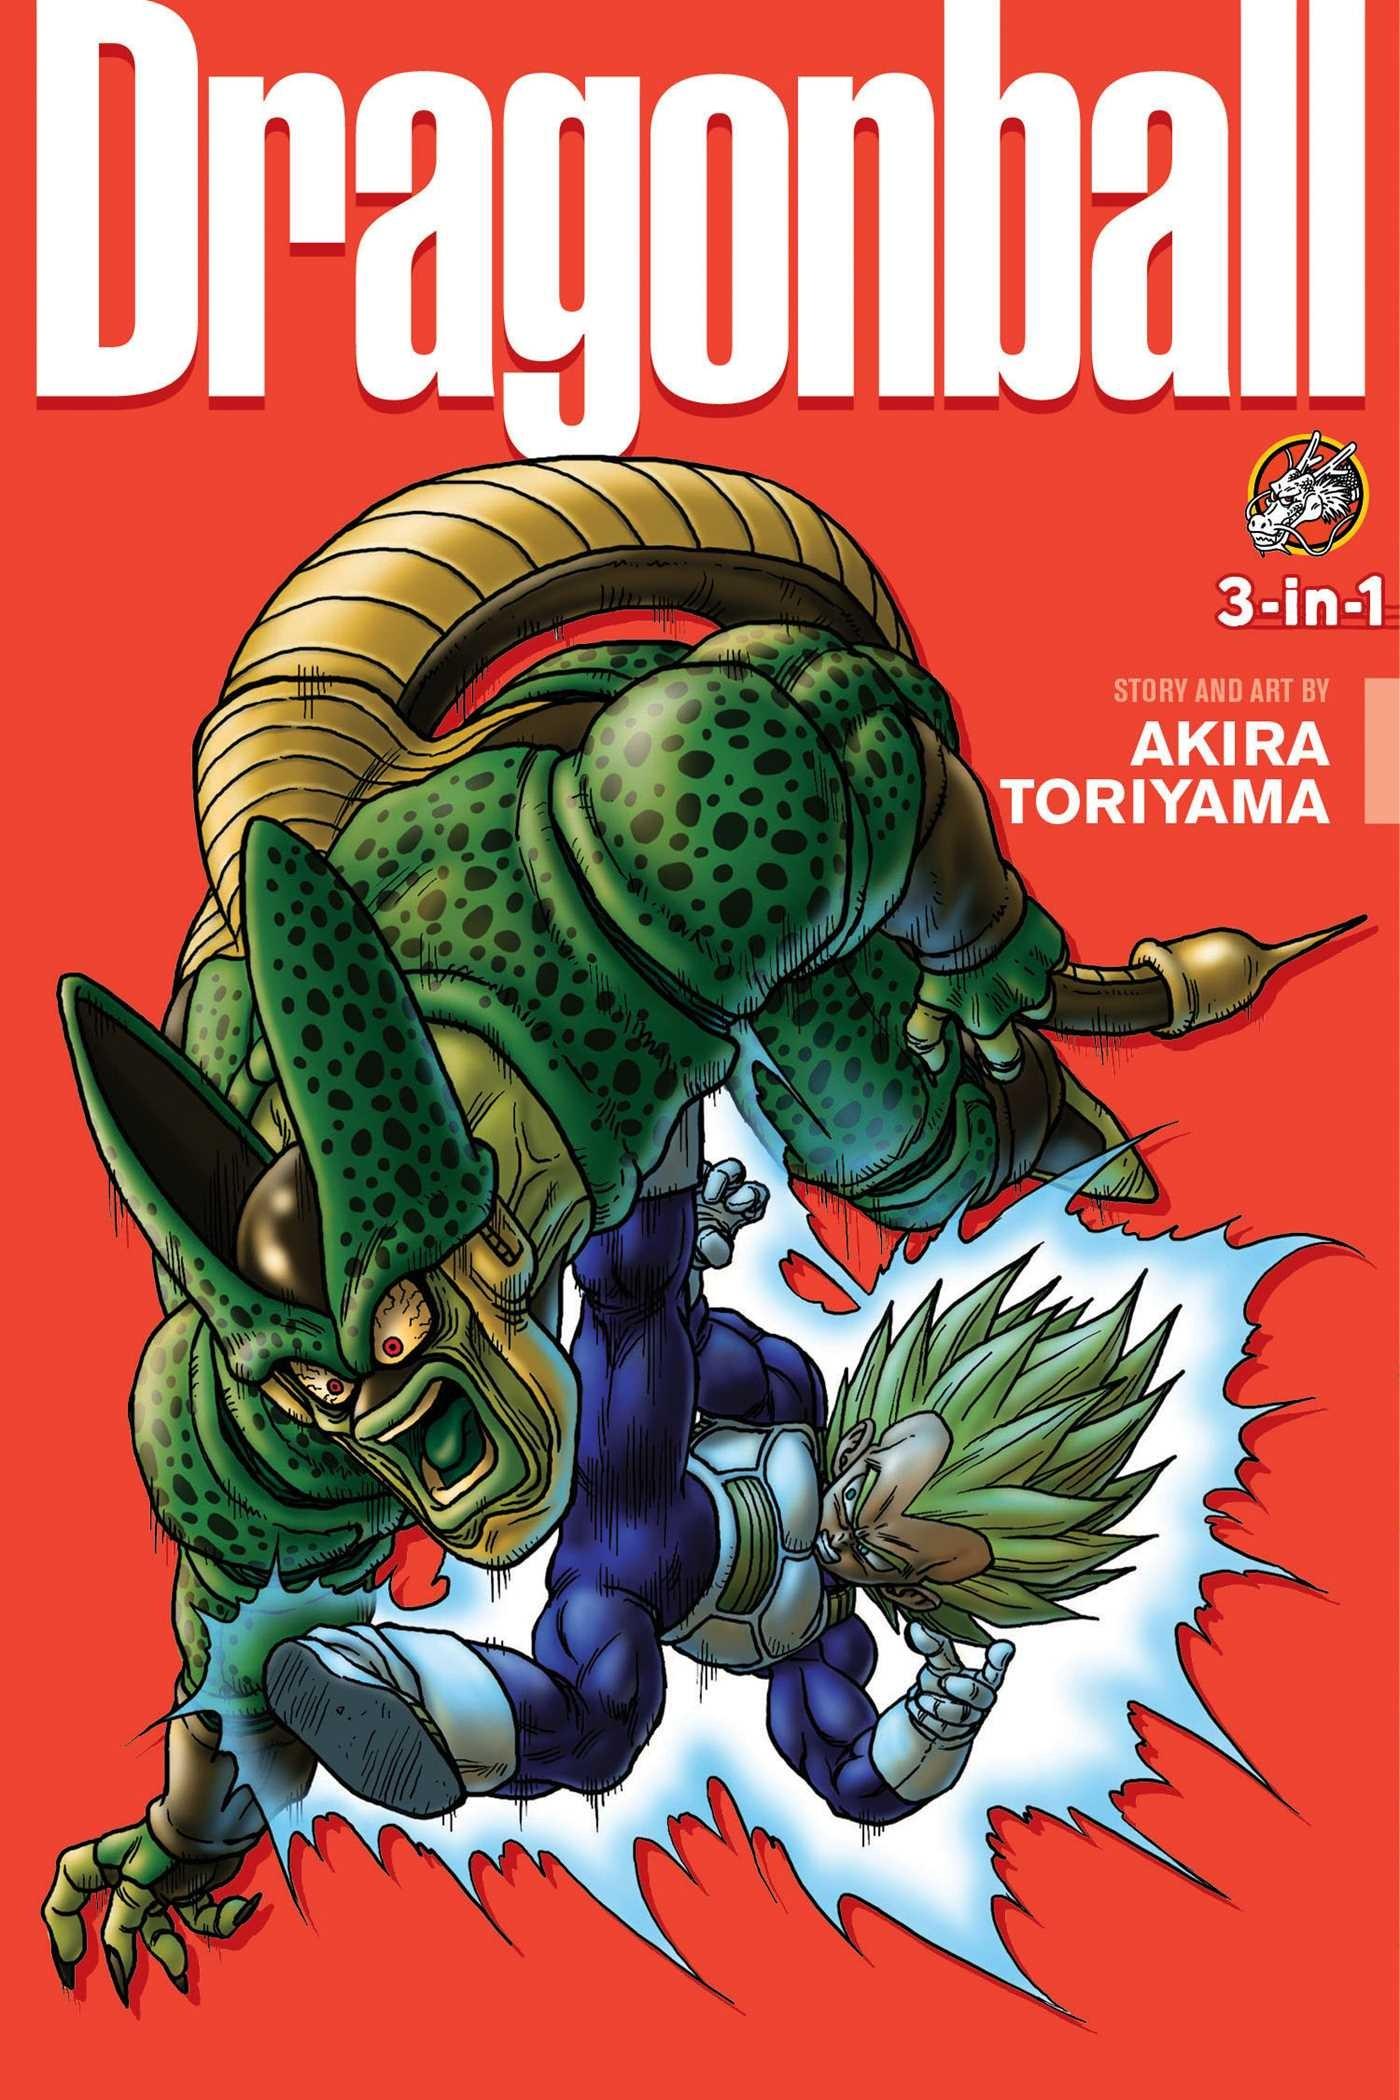 Dragon Ball (3-in-1 Edition), Vol. 11 by Akira Toriyama